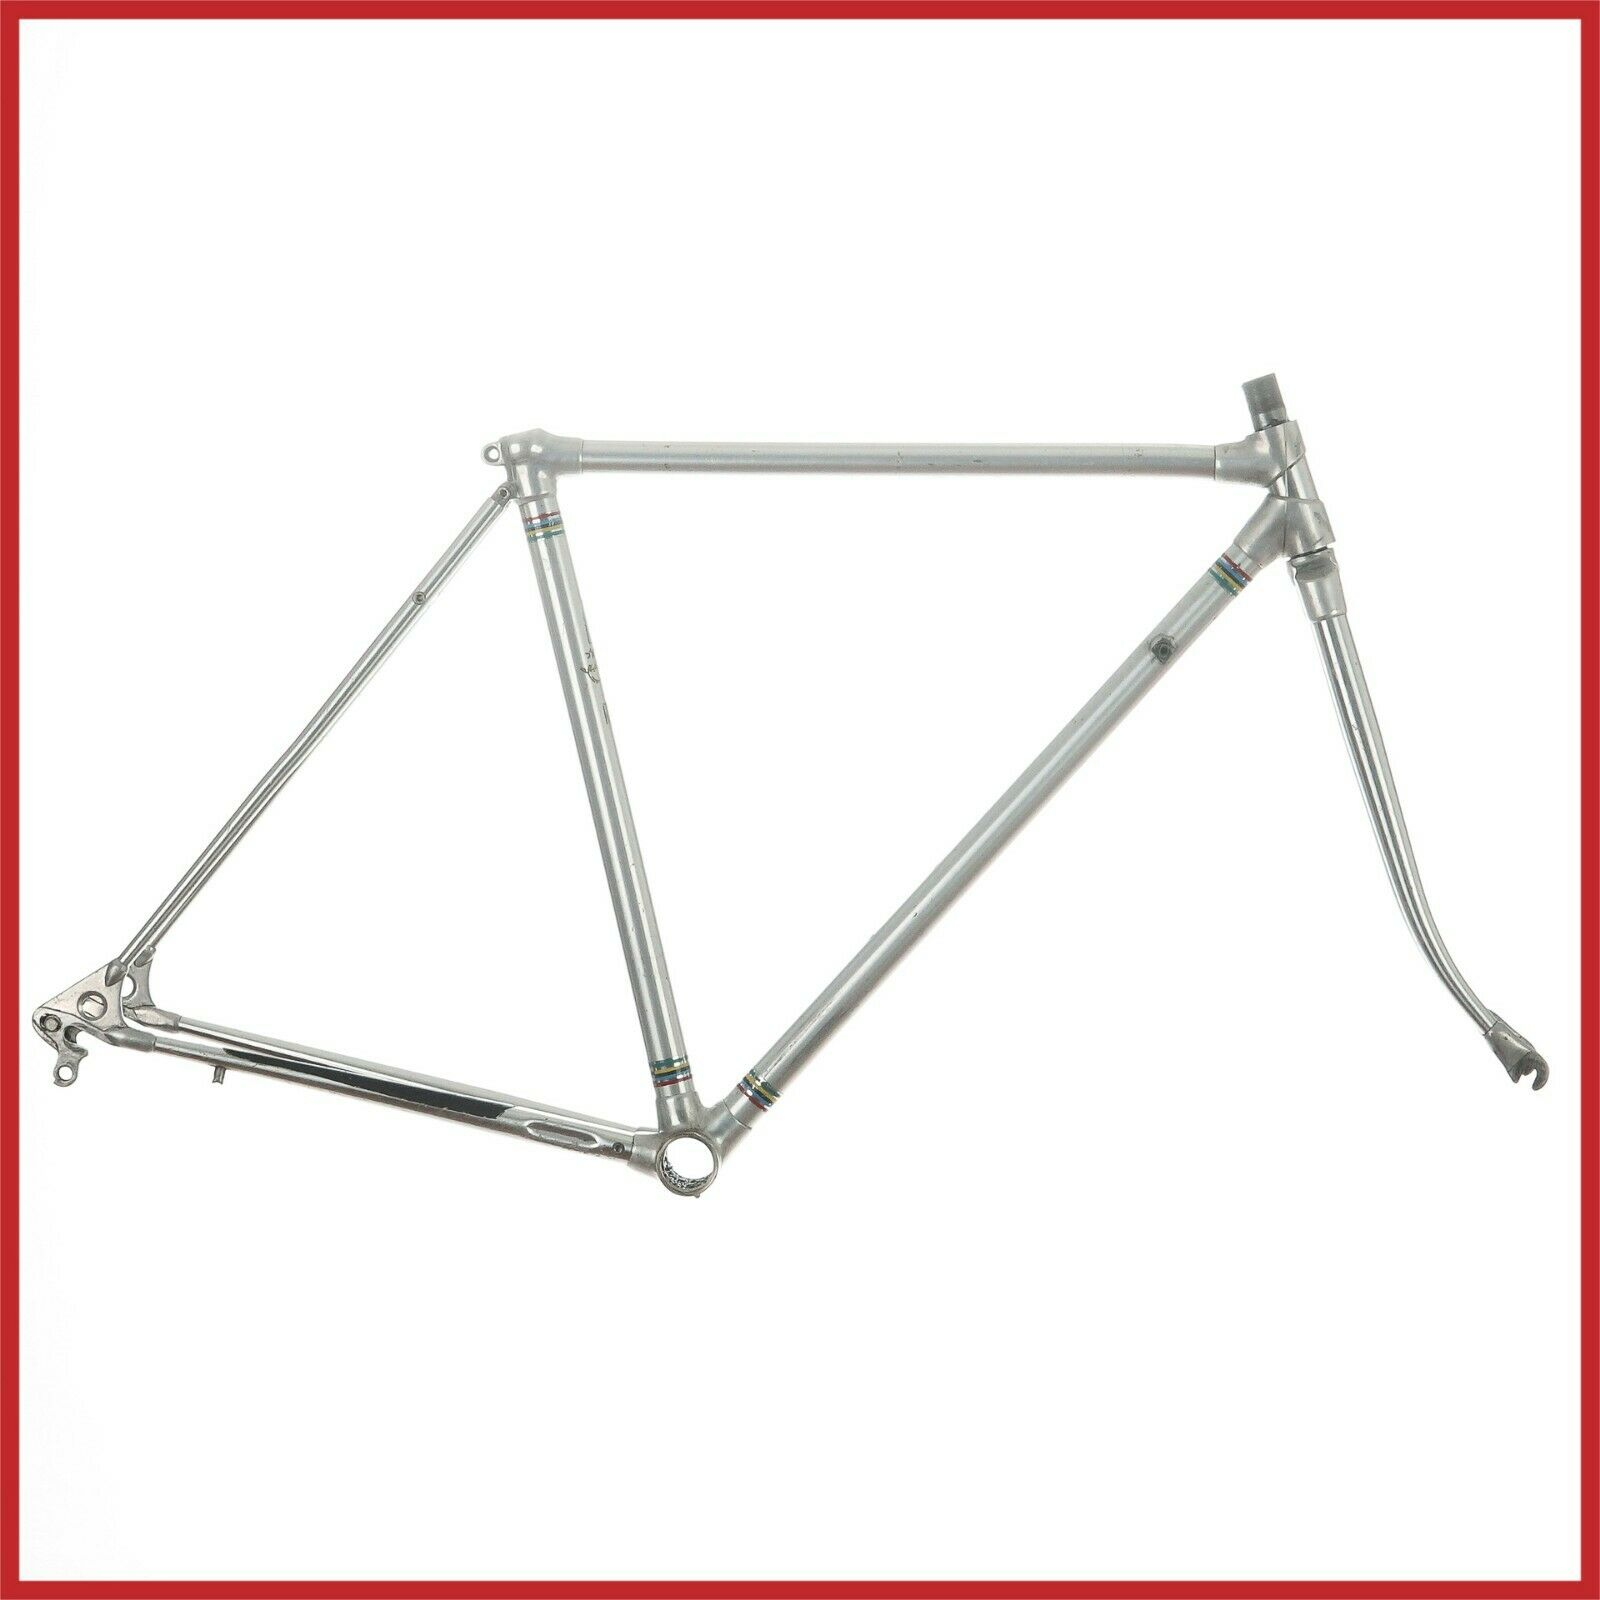 Cuadro Marco De Aluminio ALAN COMPETIZIONE 70s Vintage Bike Lugs EROICA Aleación